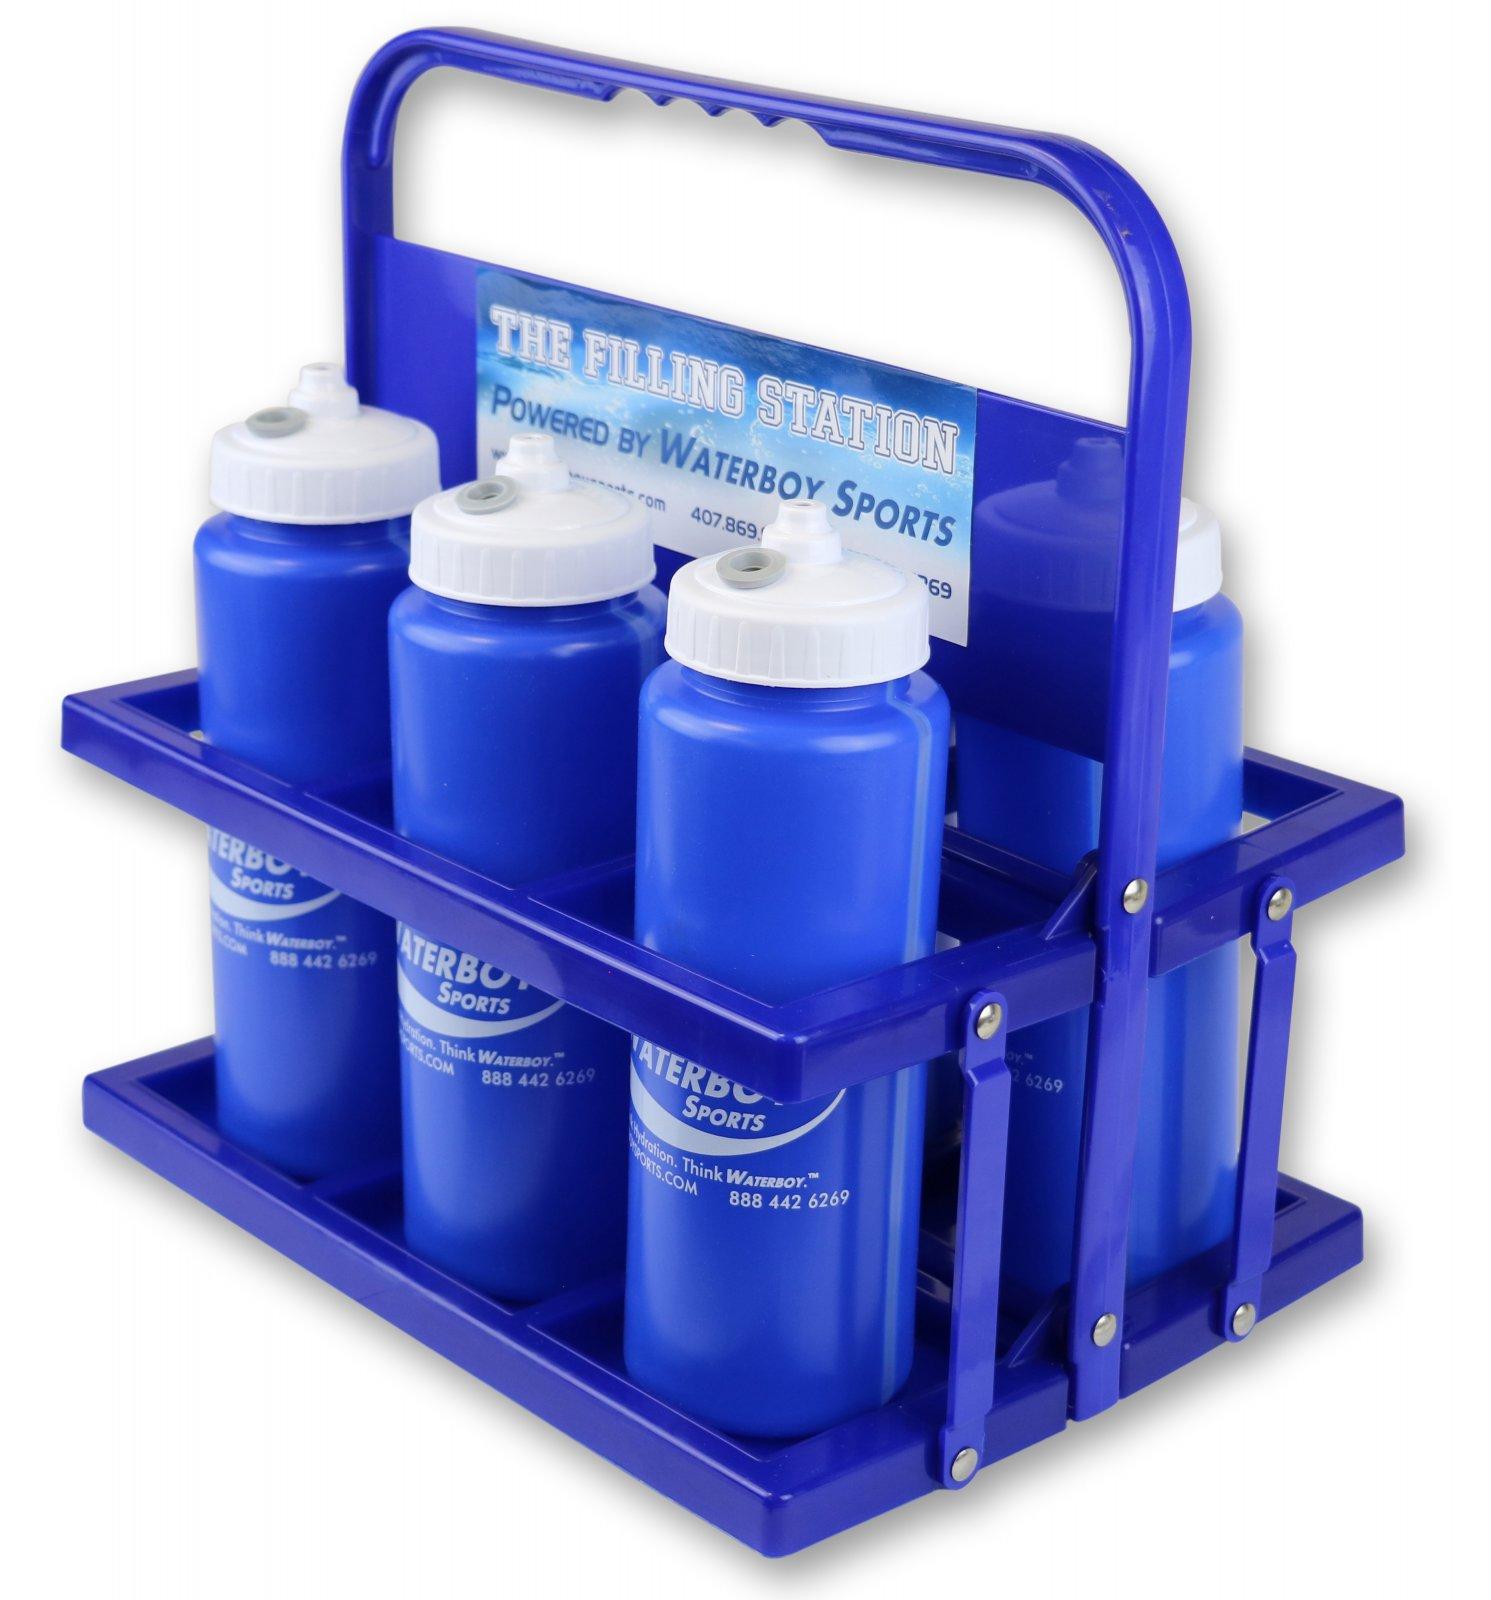 Collapsible Bottle Carrier w/ 6 Bottles (DB-6PK +)